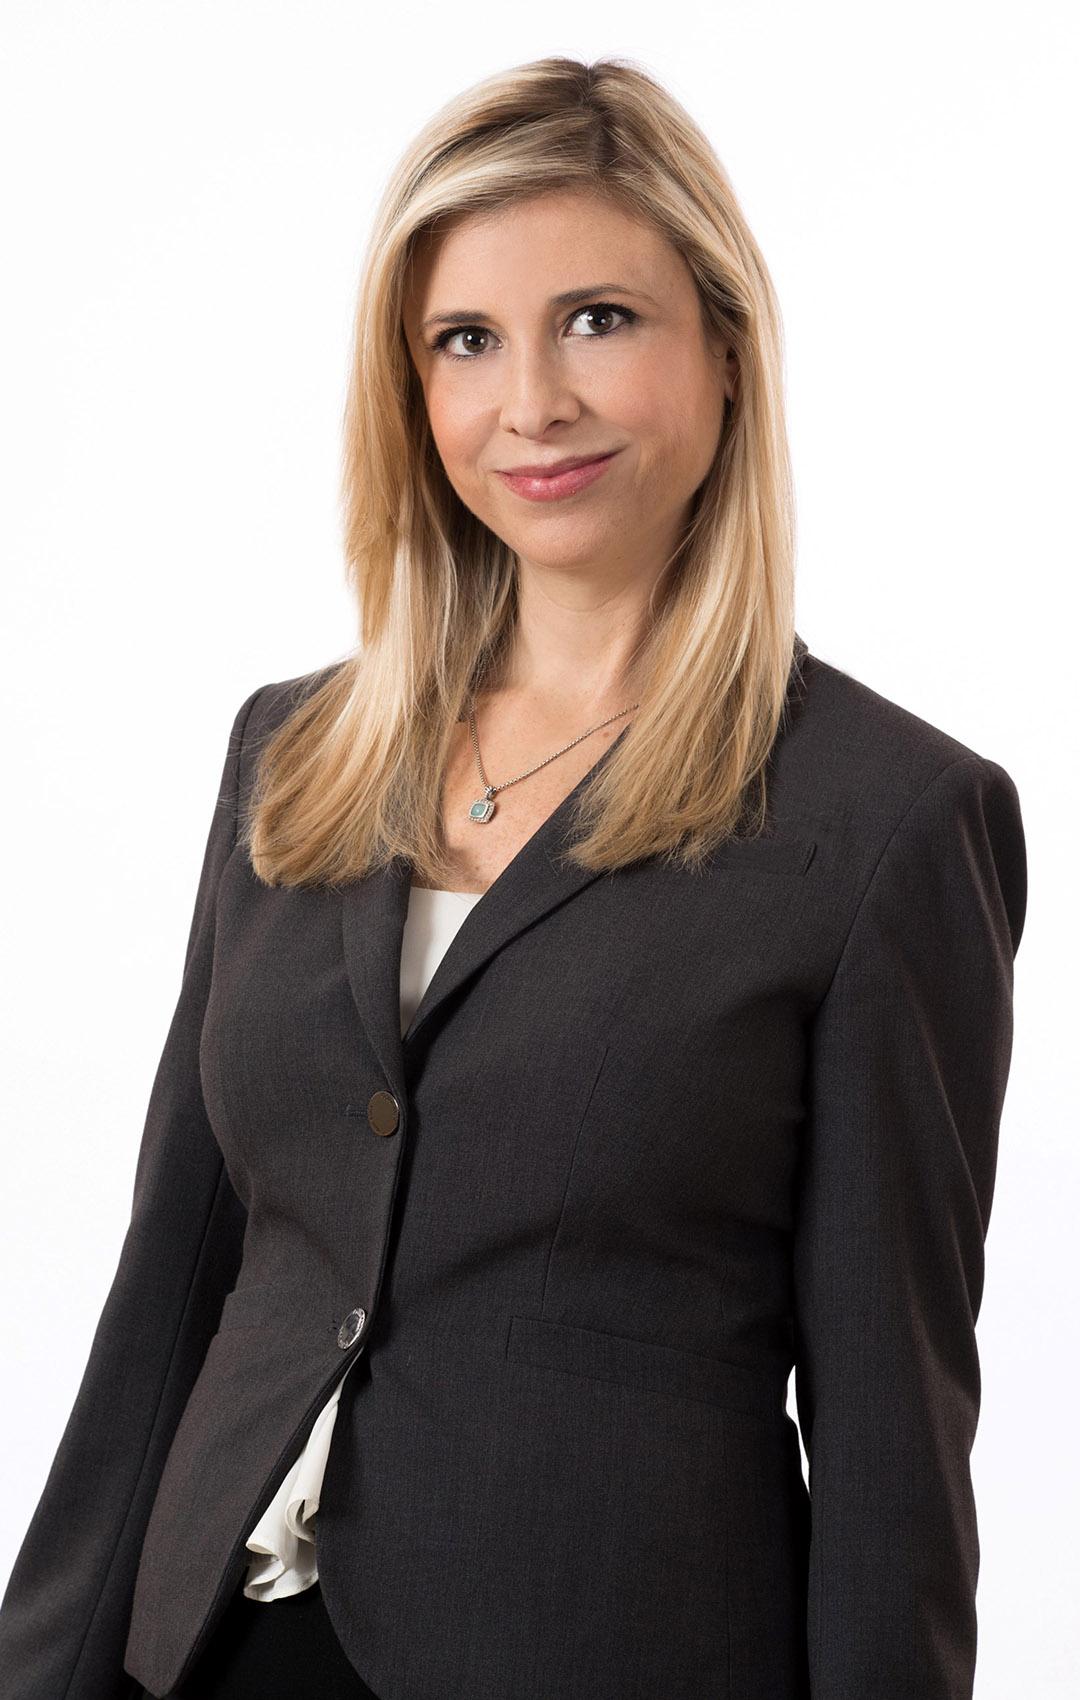 Melissa J. Gomberg